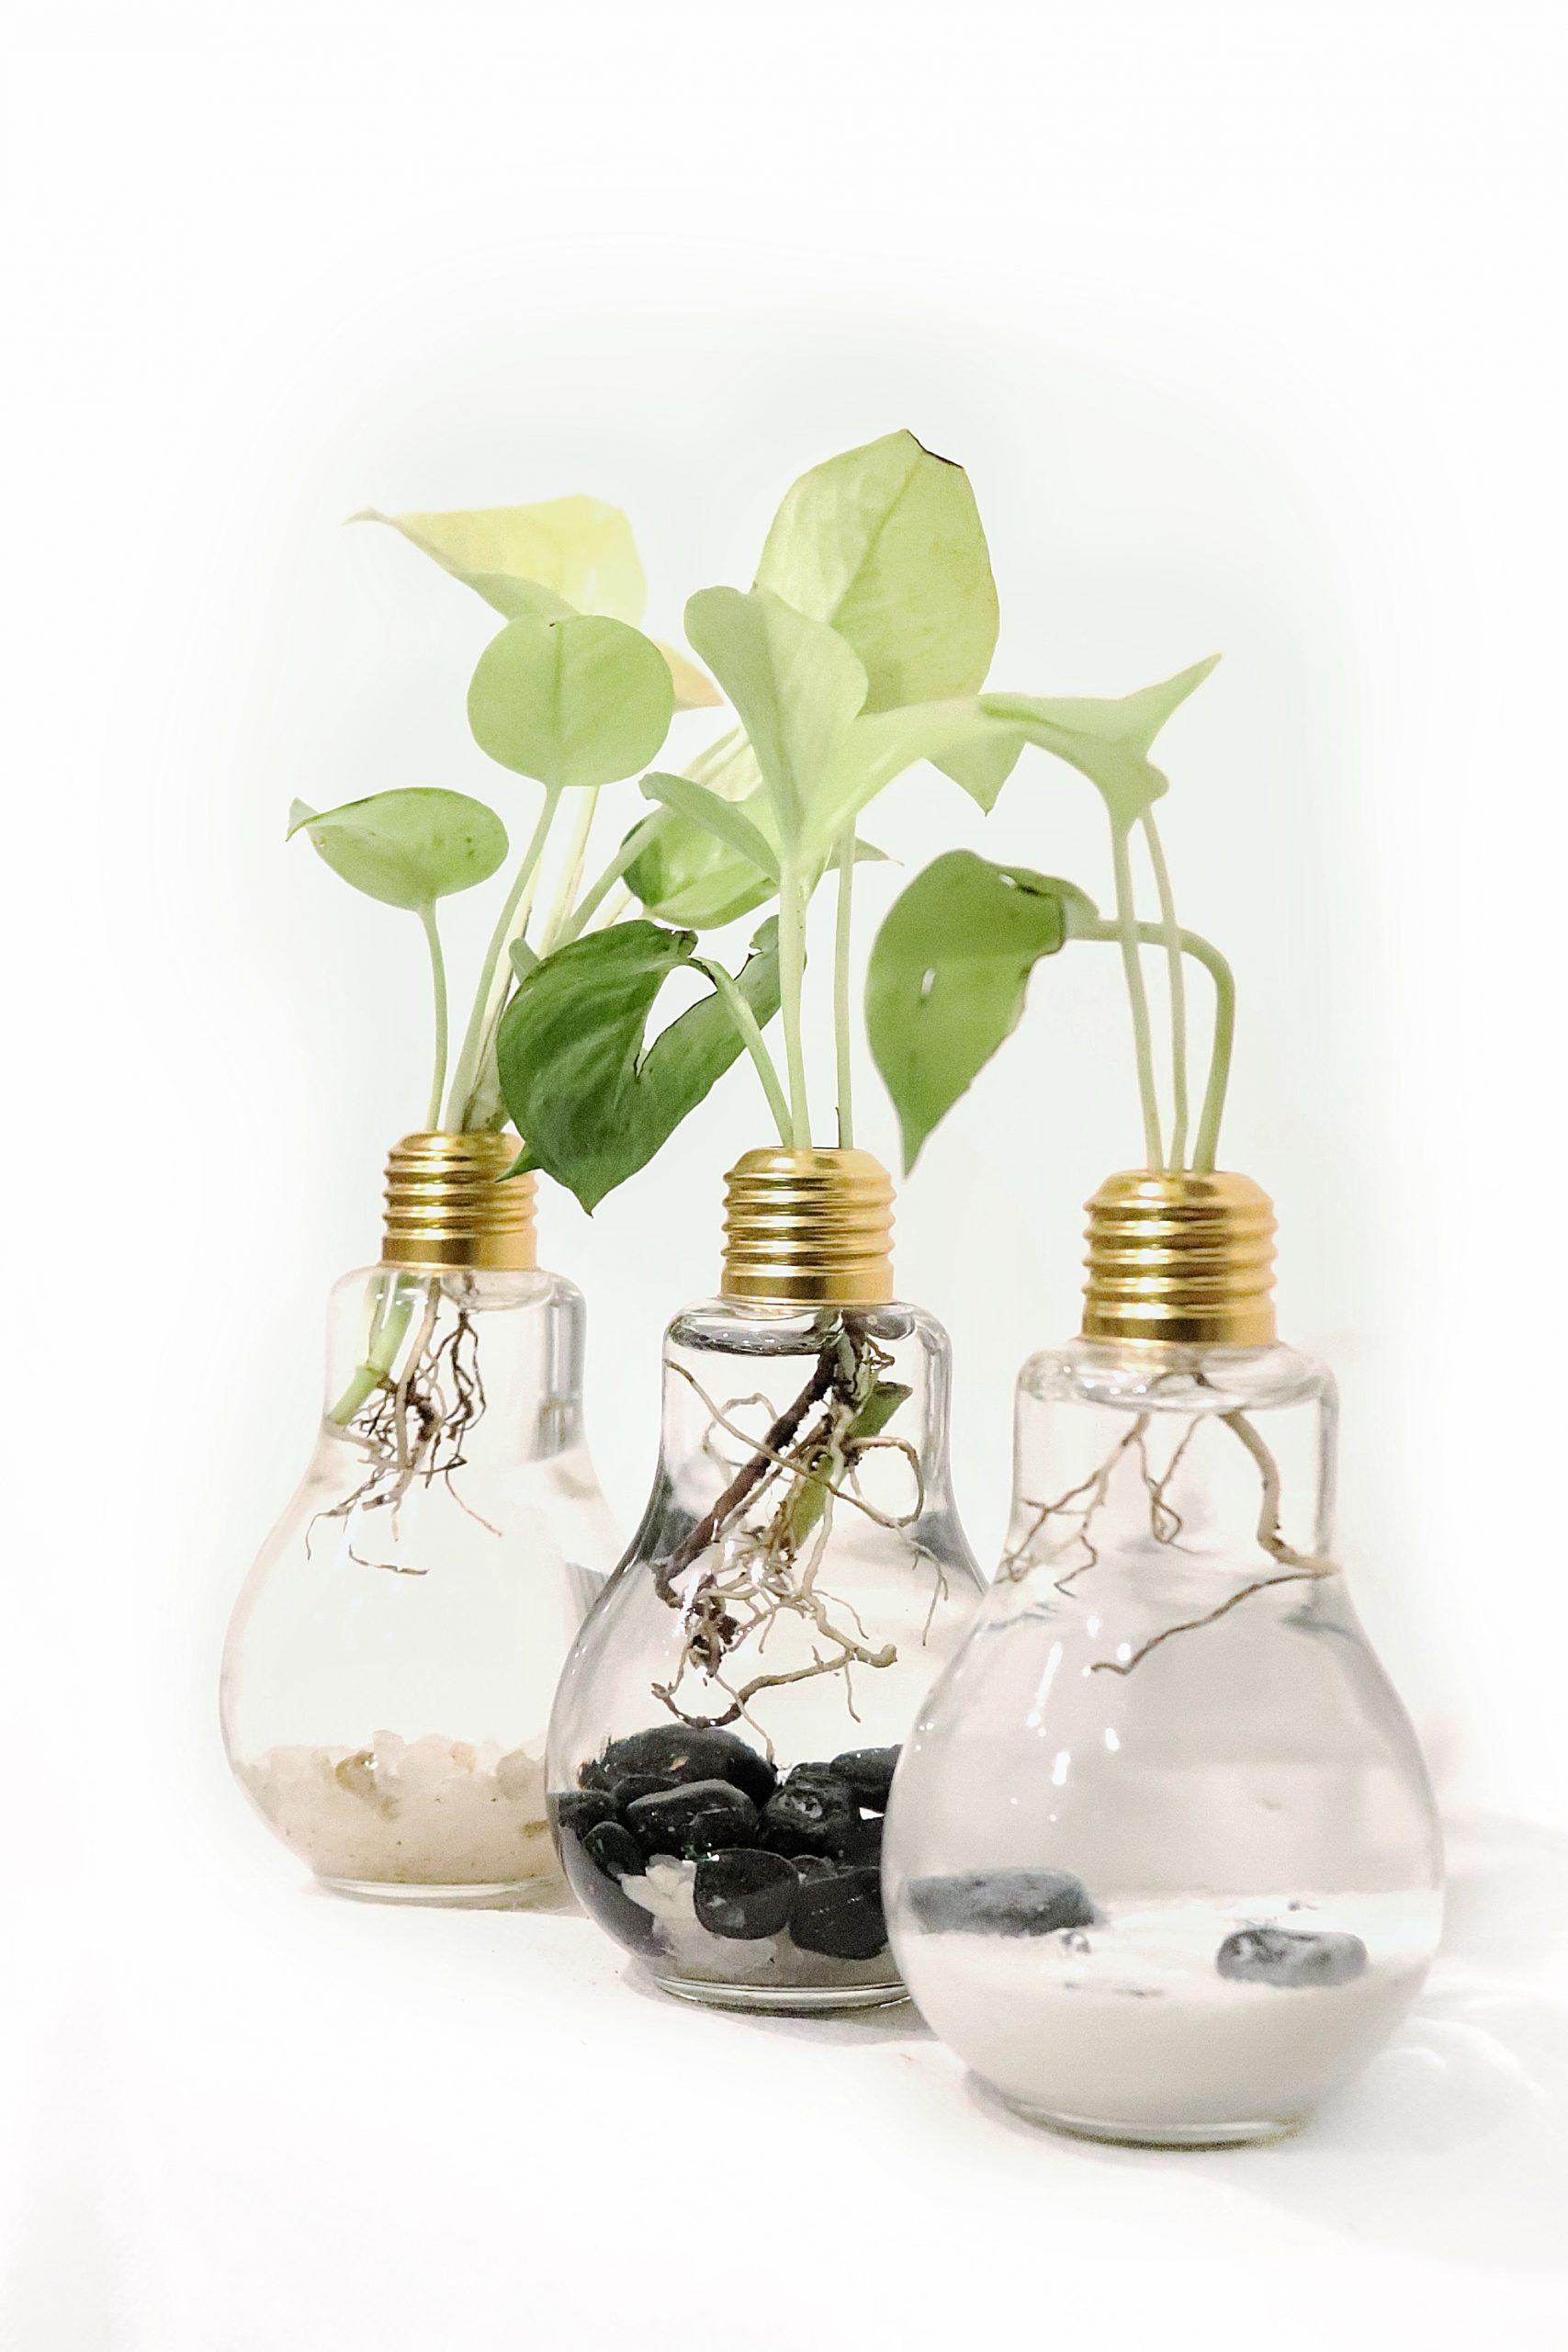 plant in light bulbs